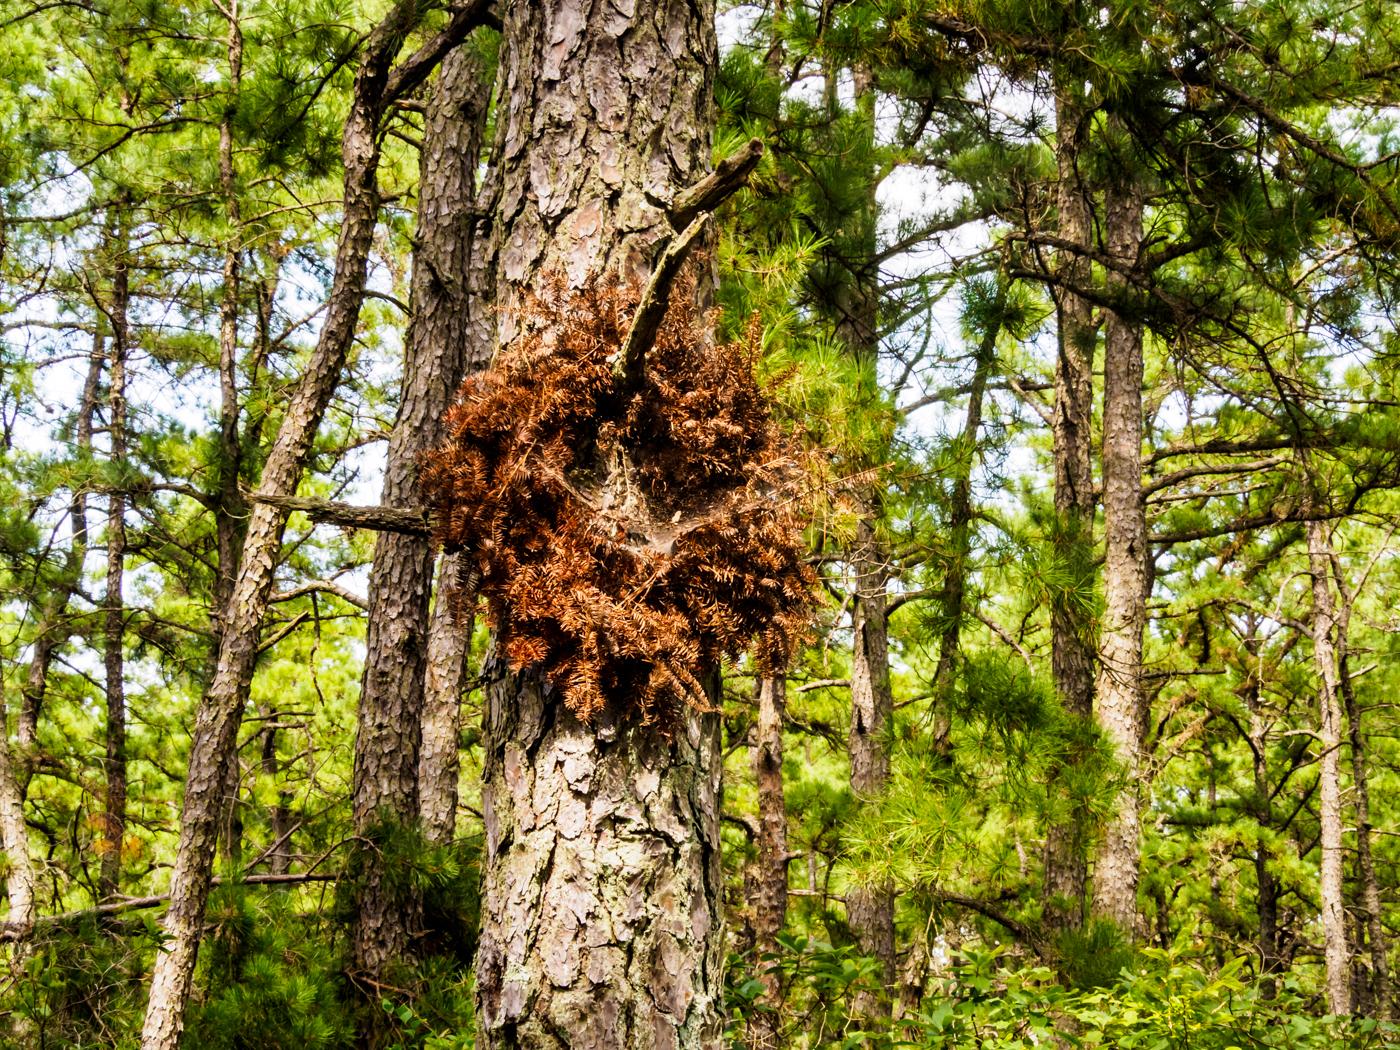 pine-wroth-8270016